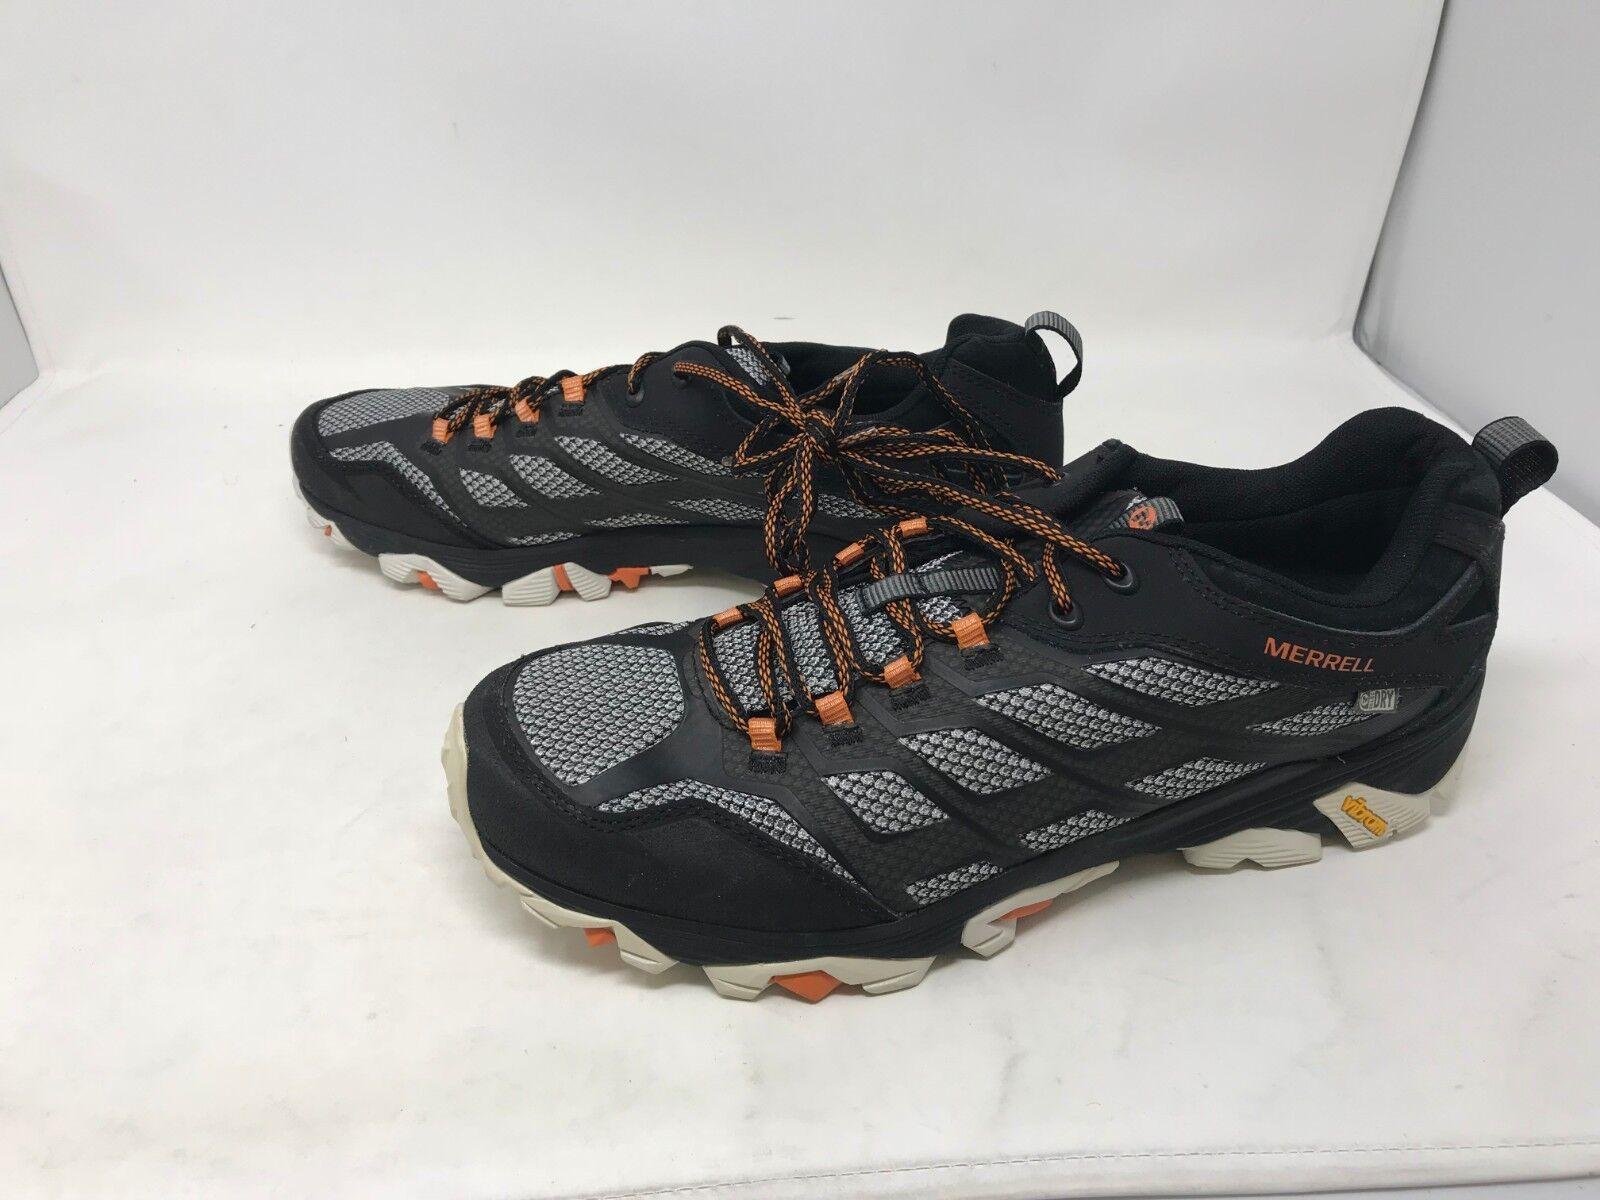 Lonsdale Herren Turnschuhe Sneakers Trainers Schuhe Freizeit Sport NEU Balham